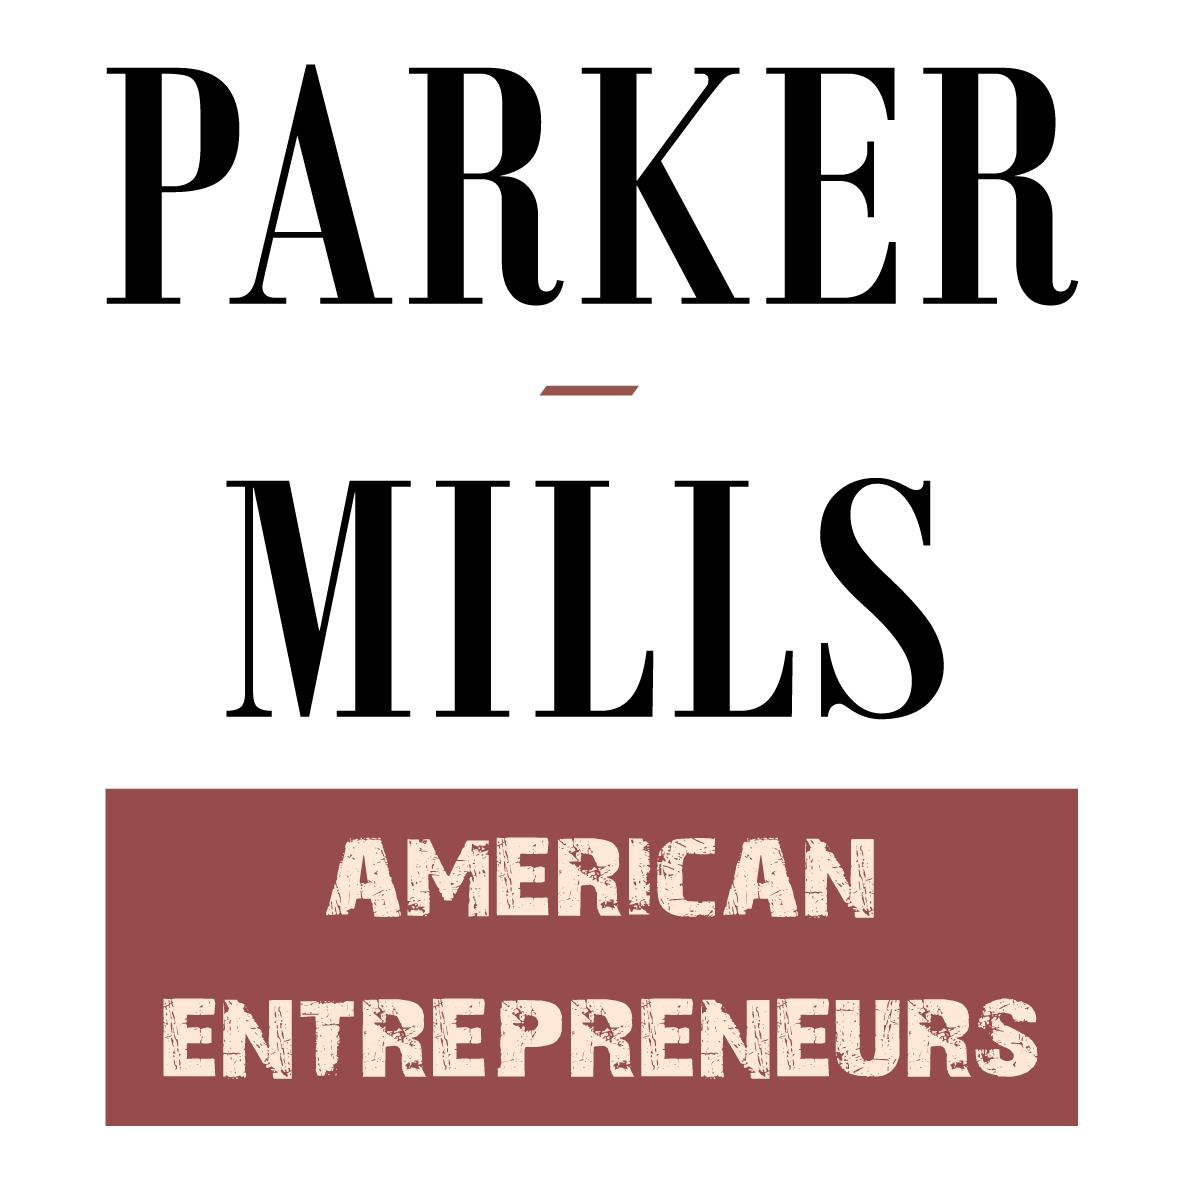 PARKER-MILLS